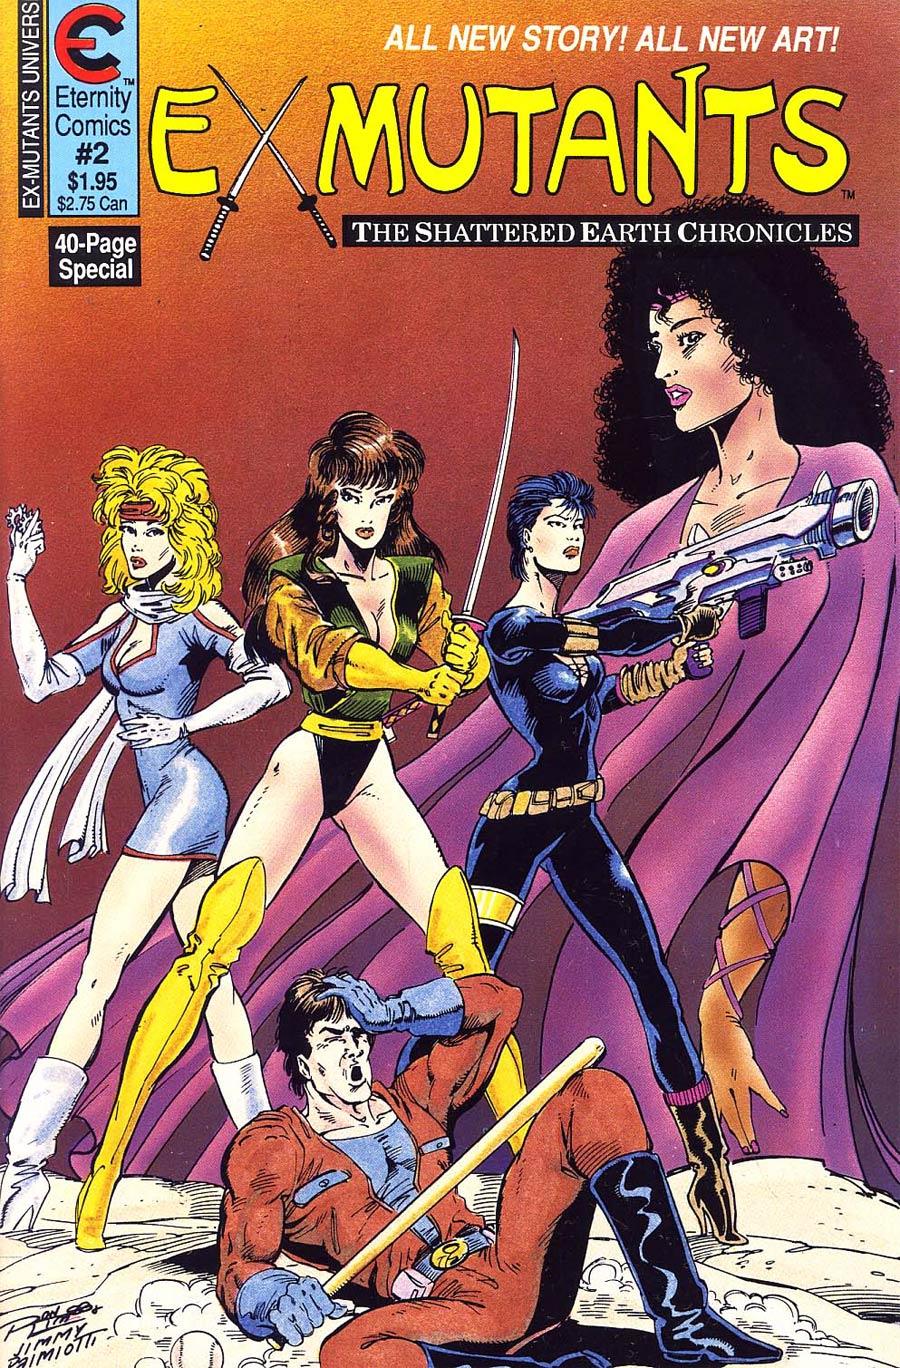 Ex-Mutants Shattered Earth Chronicles #2